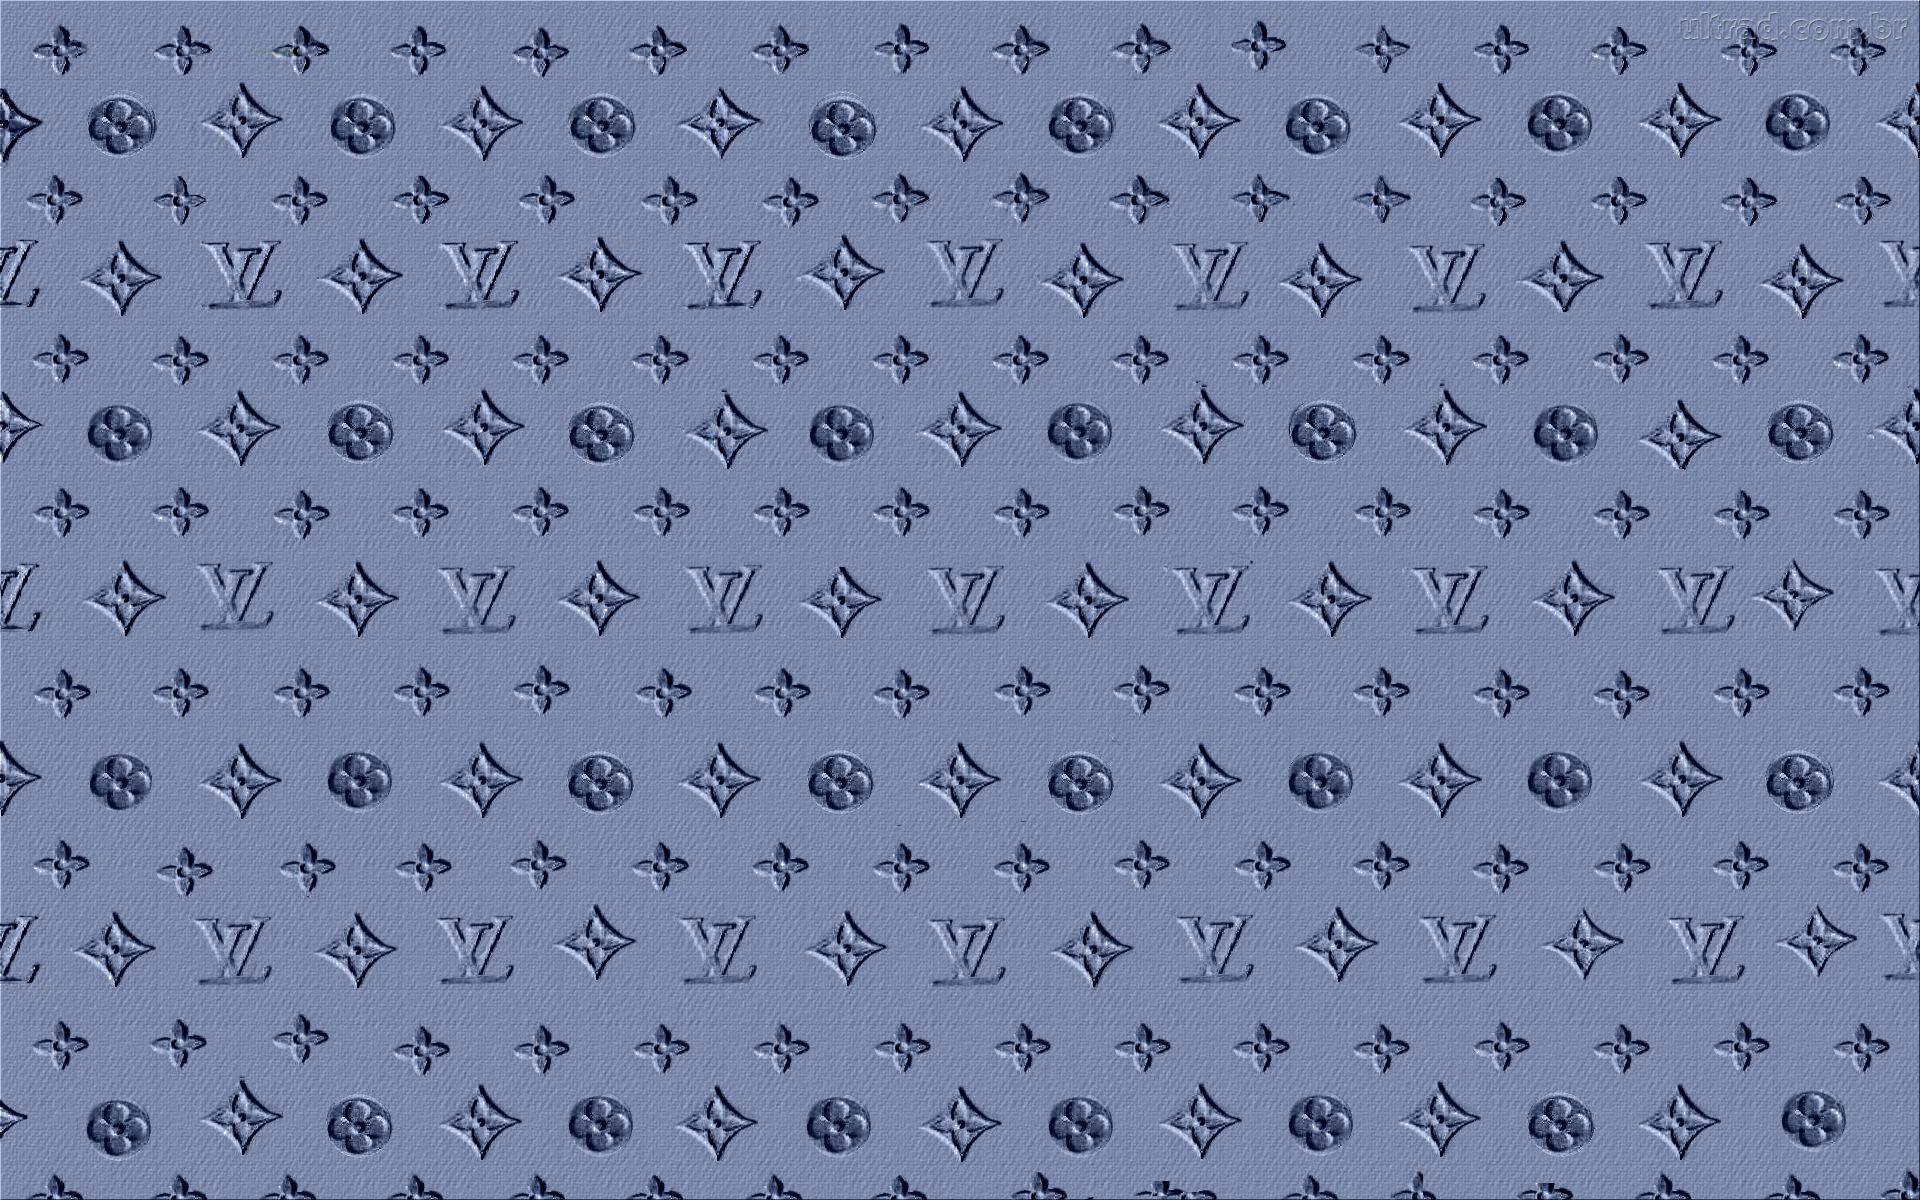 Wallpapers For > Louis Vuitton Wallpaper Blue